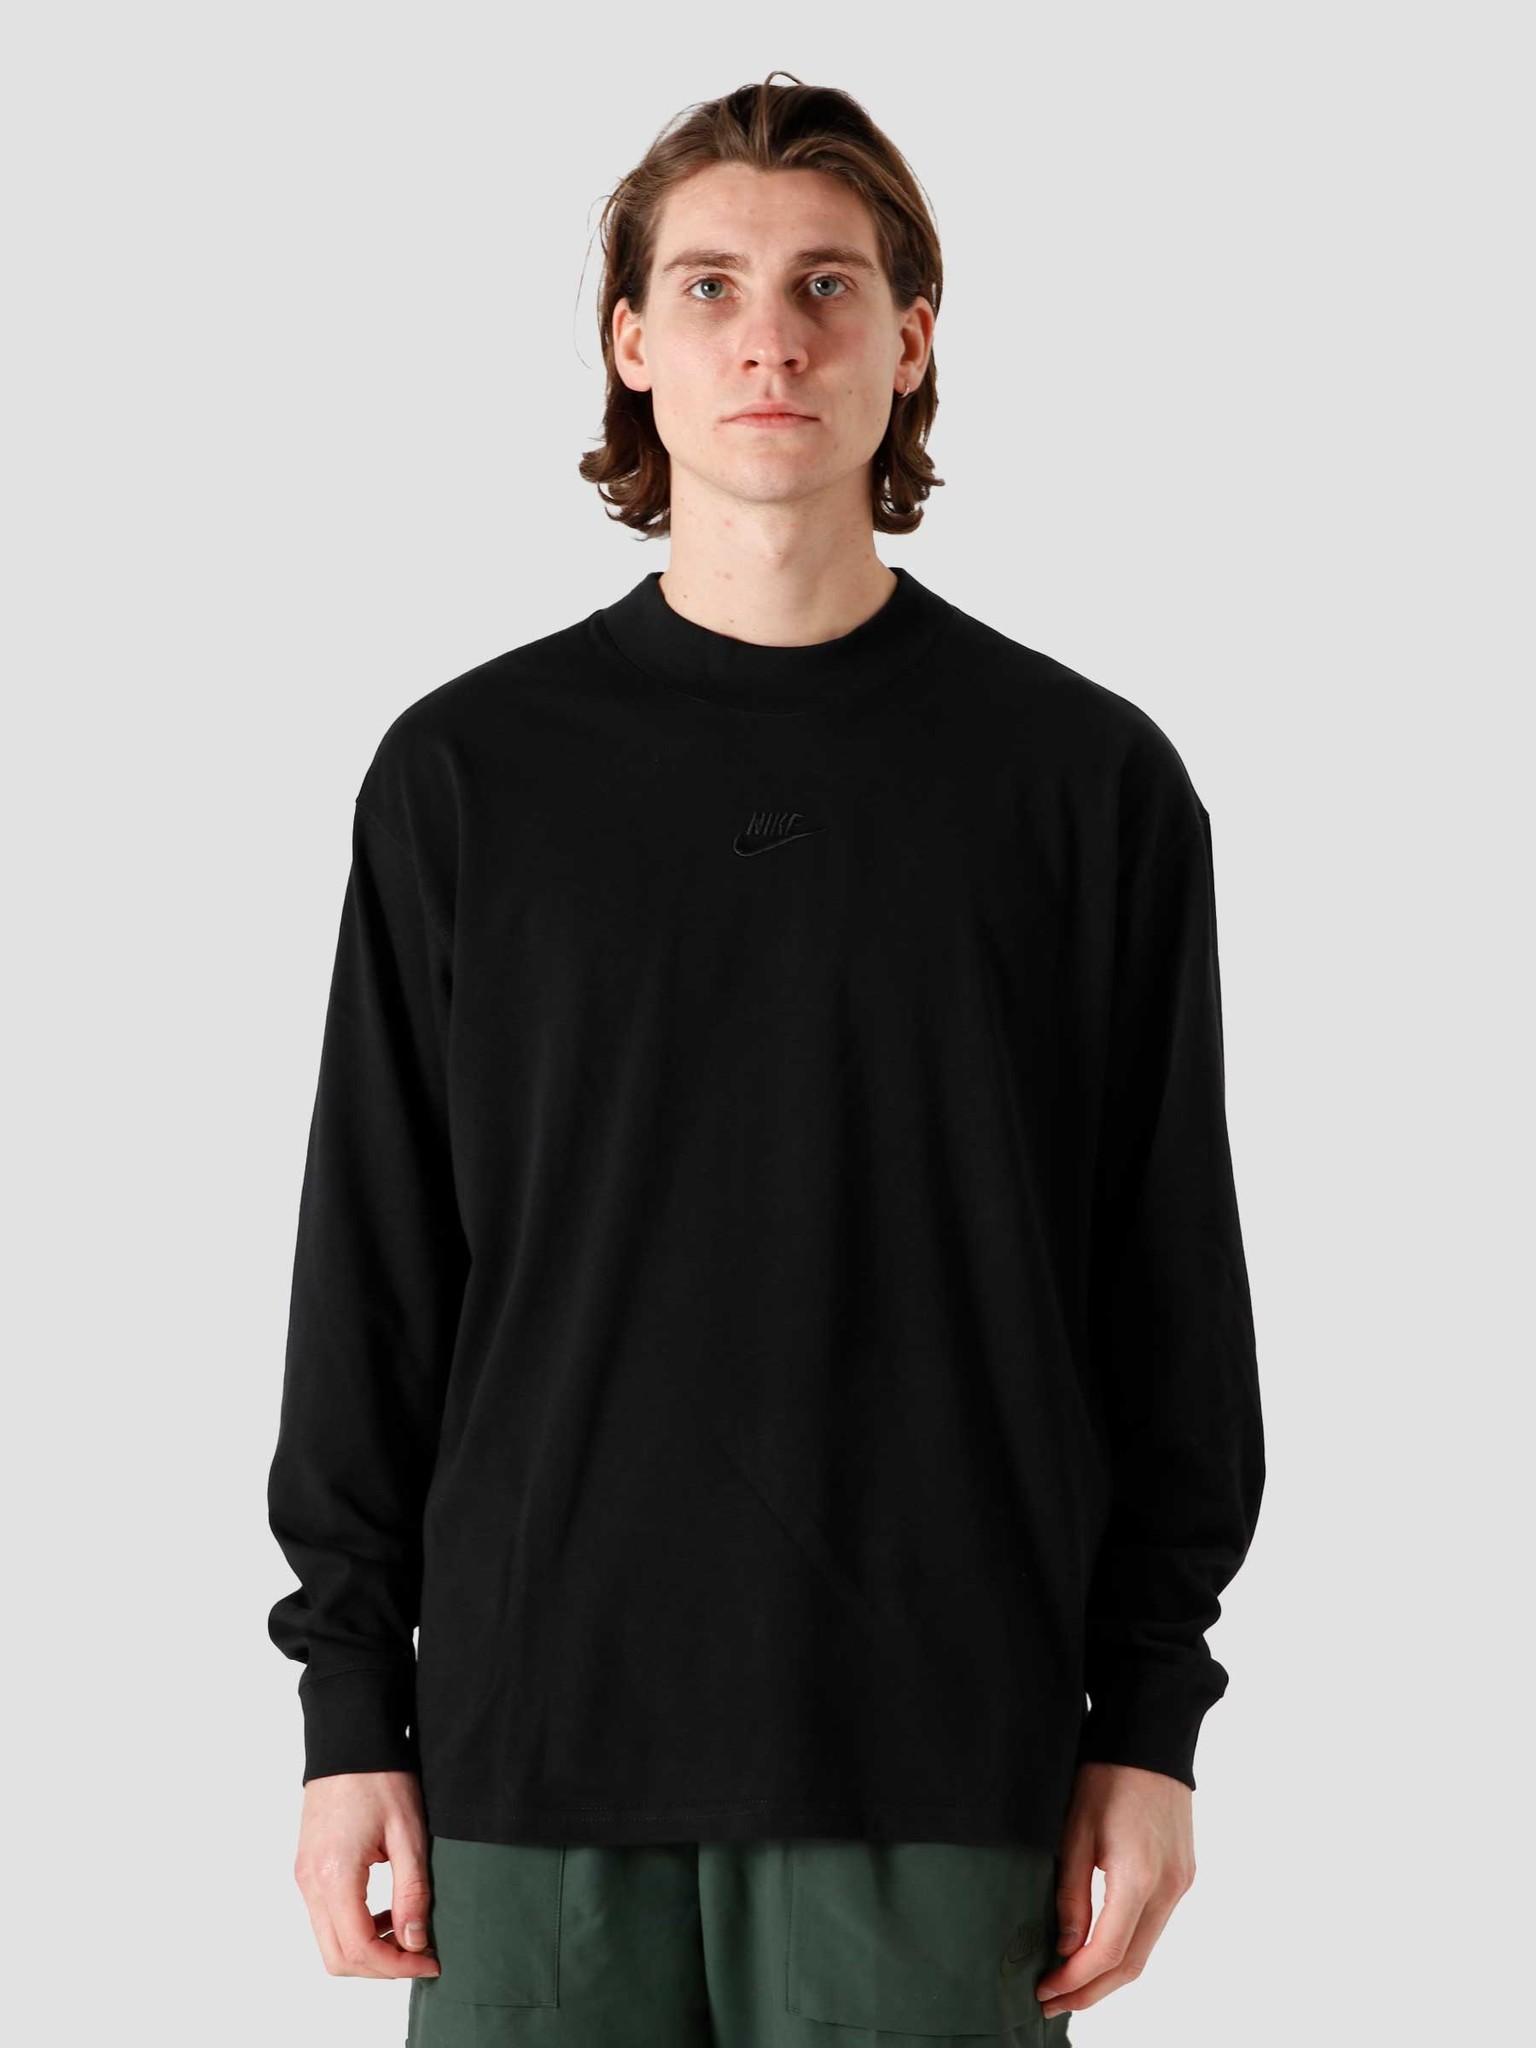 NSW T-Shirt Essentials Black CZ2287-010